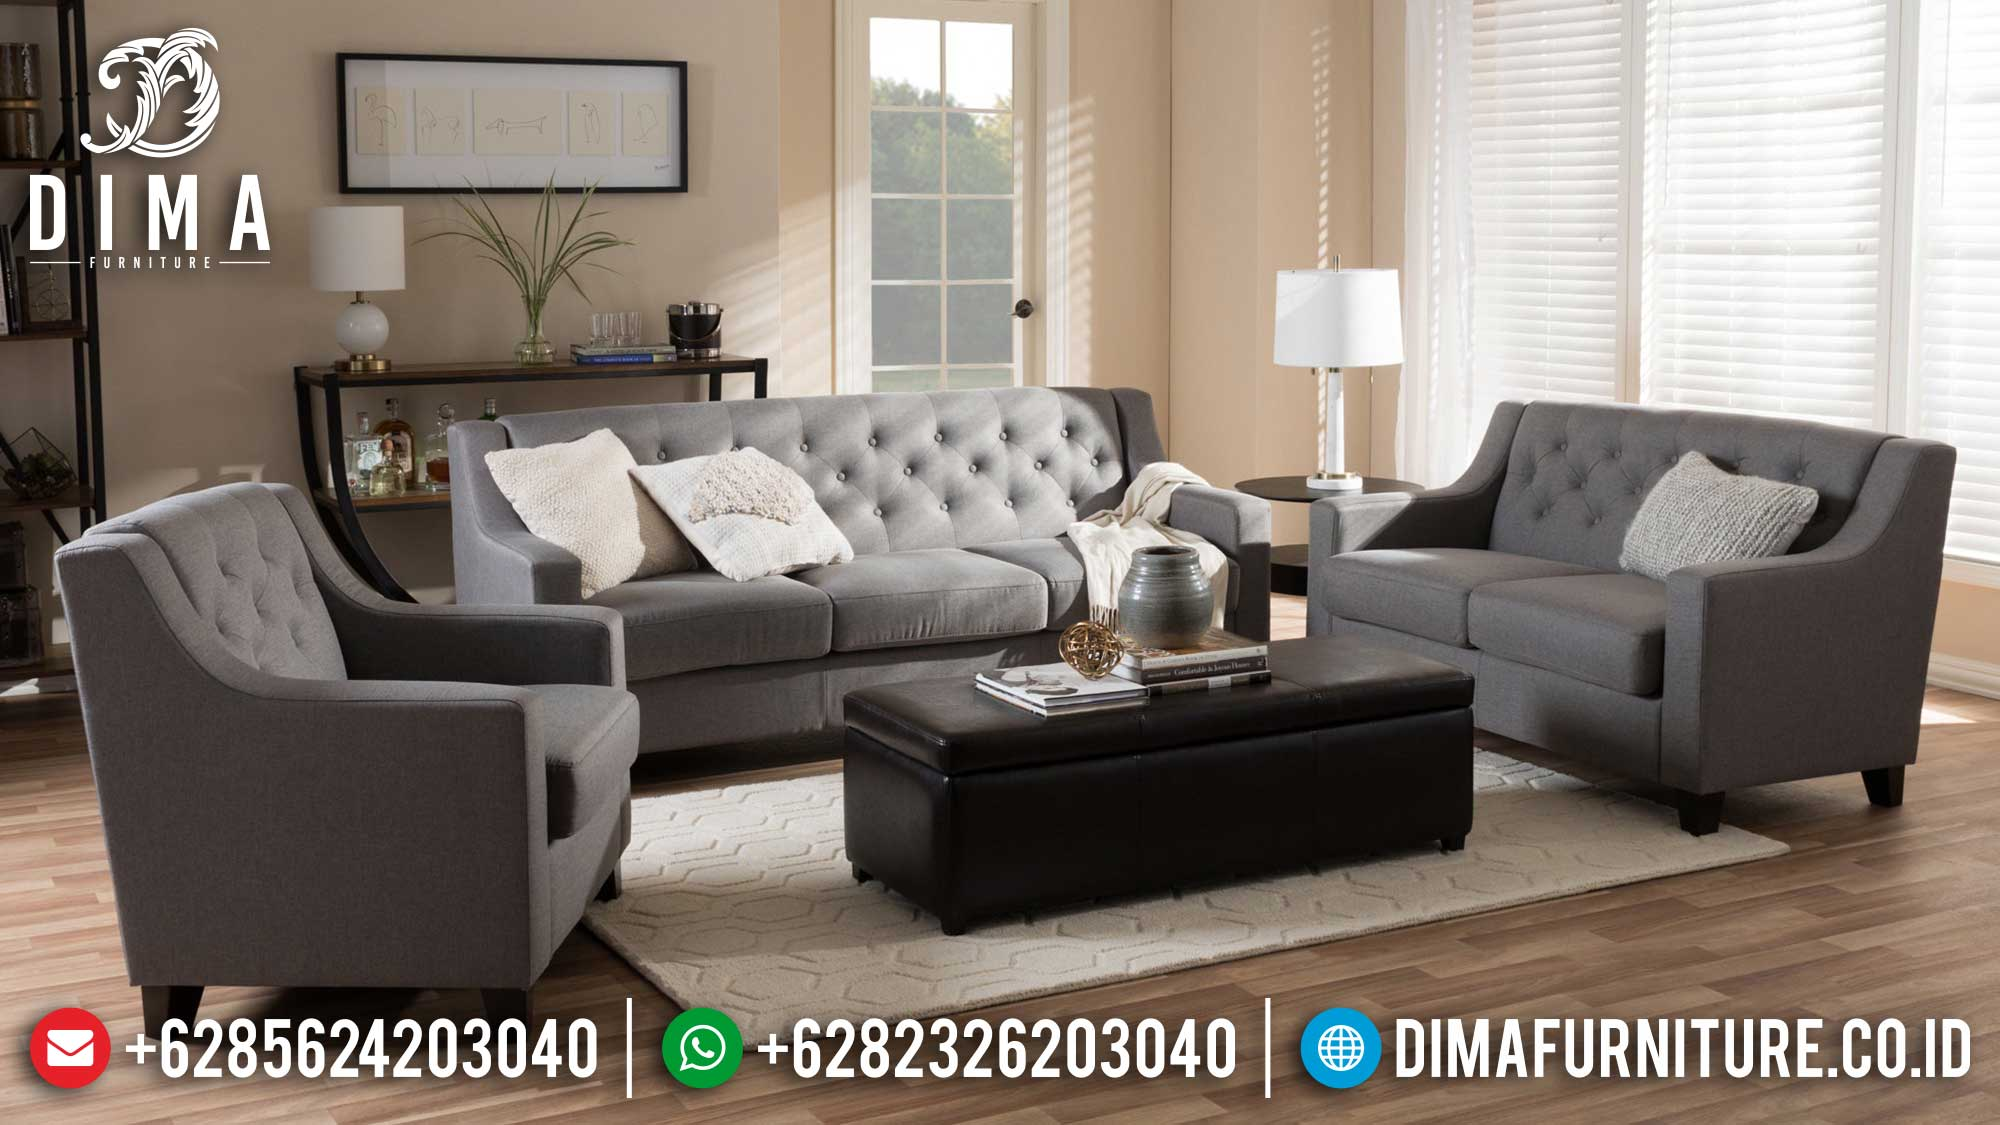 Sofa Tamu Jepara Minimalis Adorable Design Mebel Jepara Luxury Mm-0896